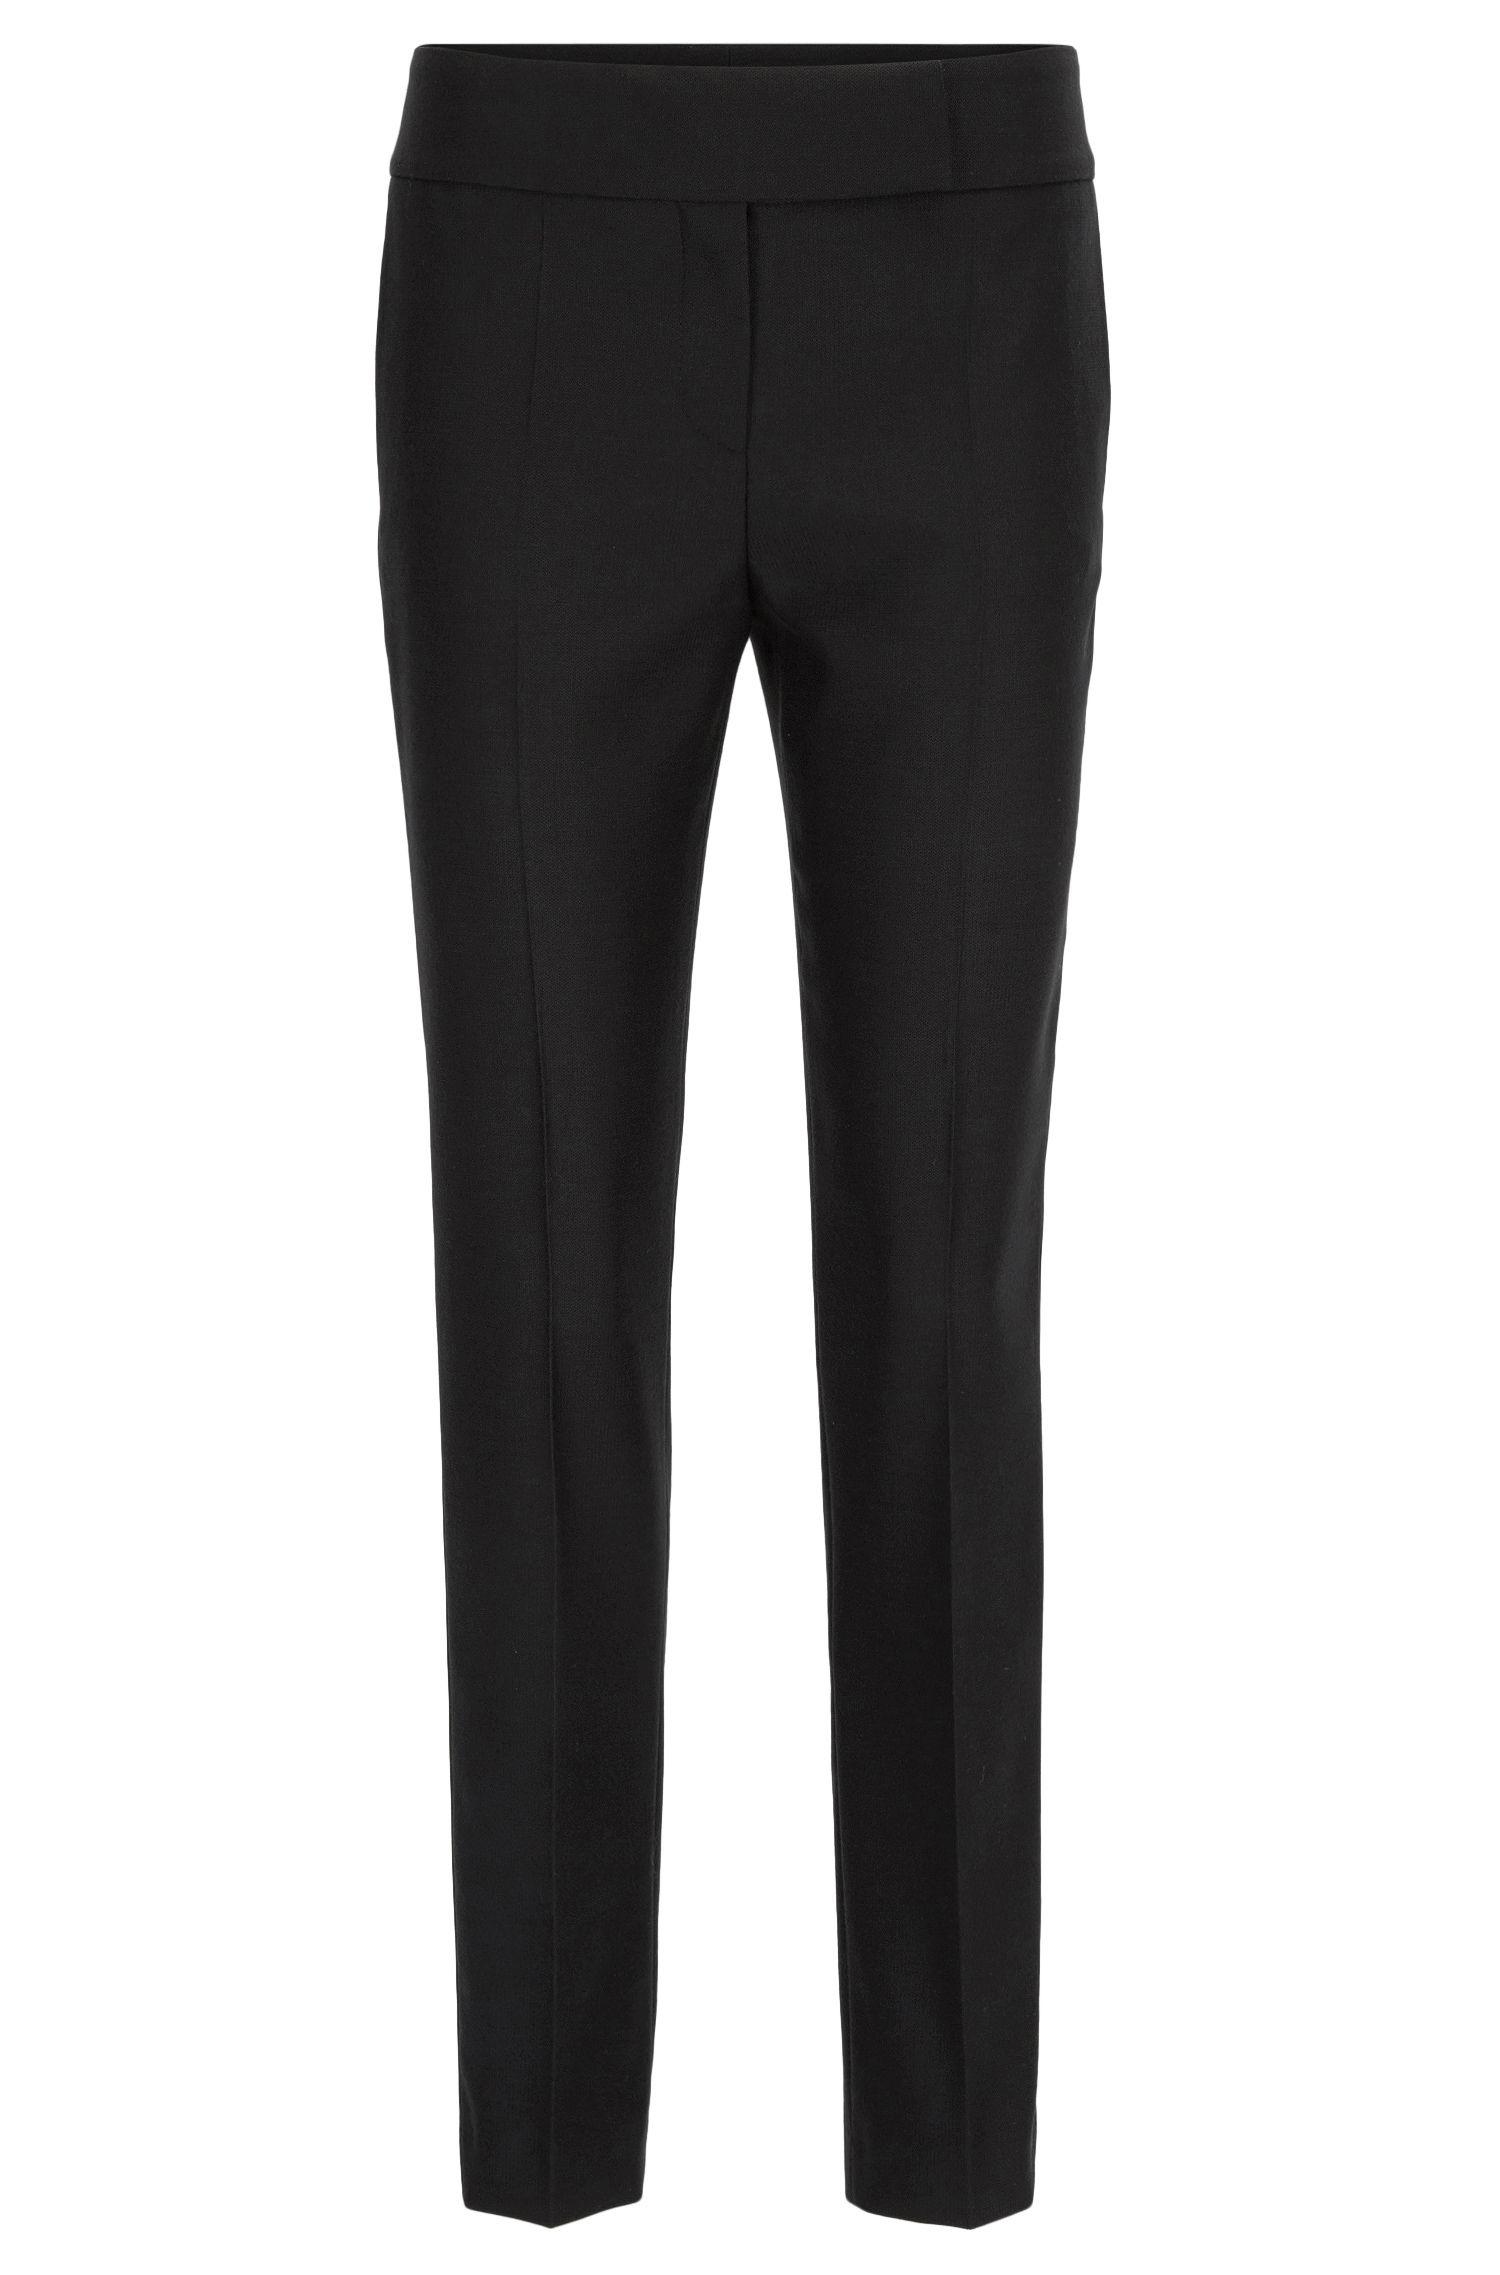 Virgin Wool Tuxedo Pant | Tivuna